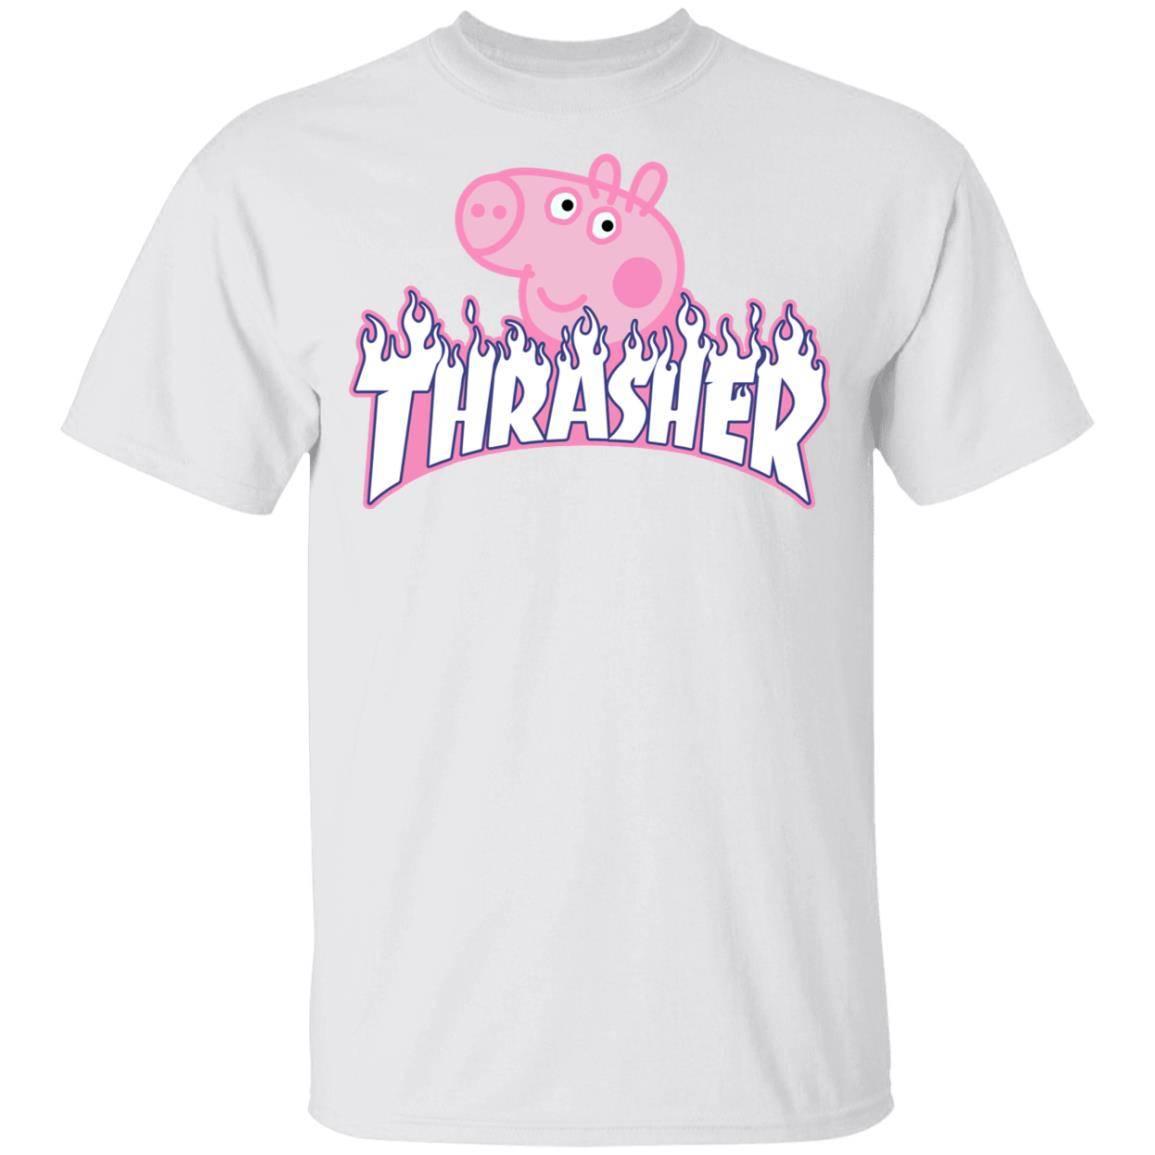 Peppa Pig Thrasher T-Shirt for Kids